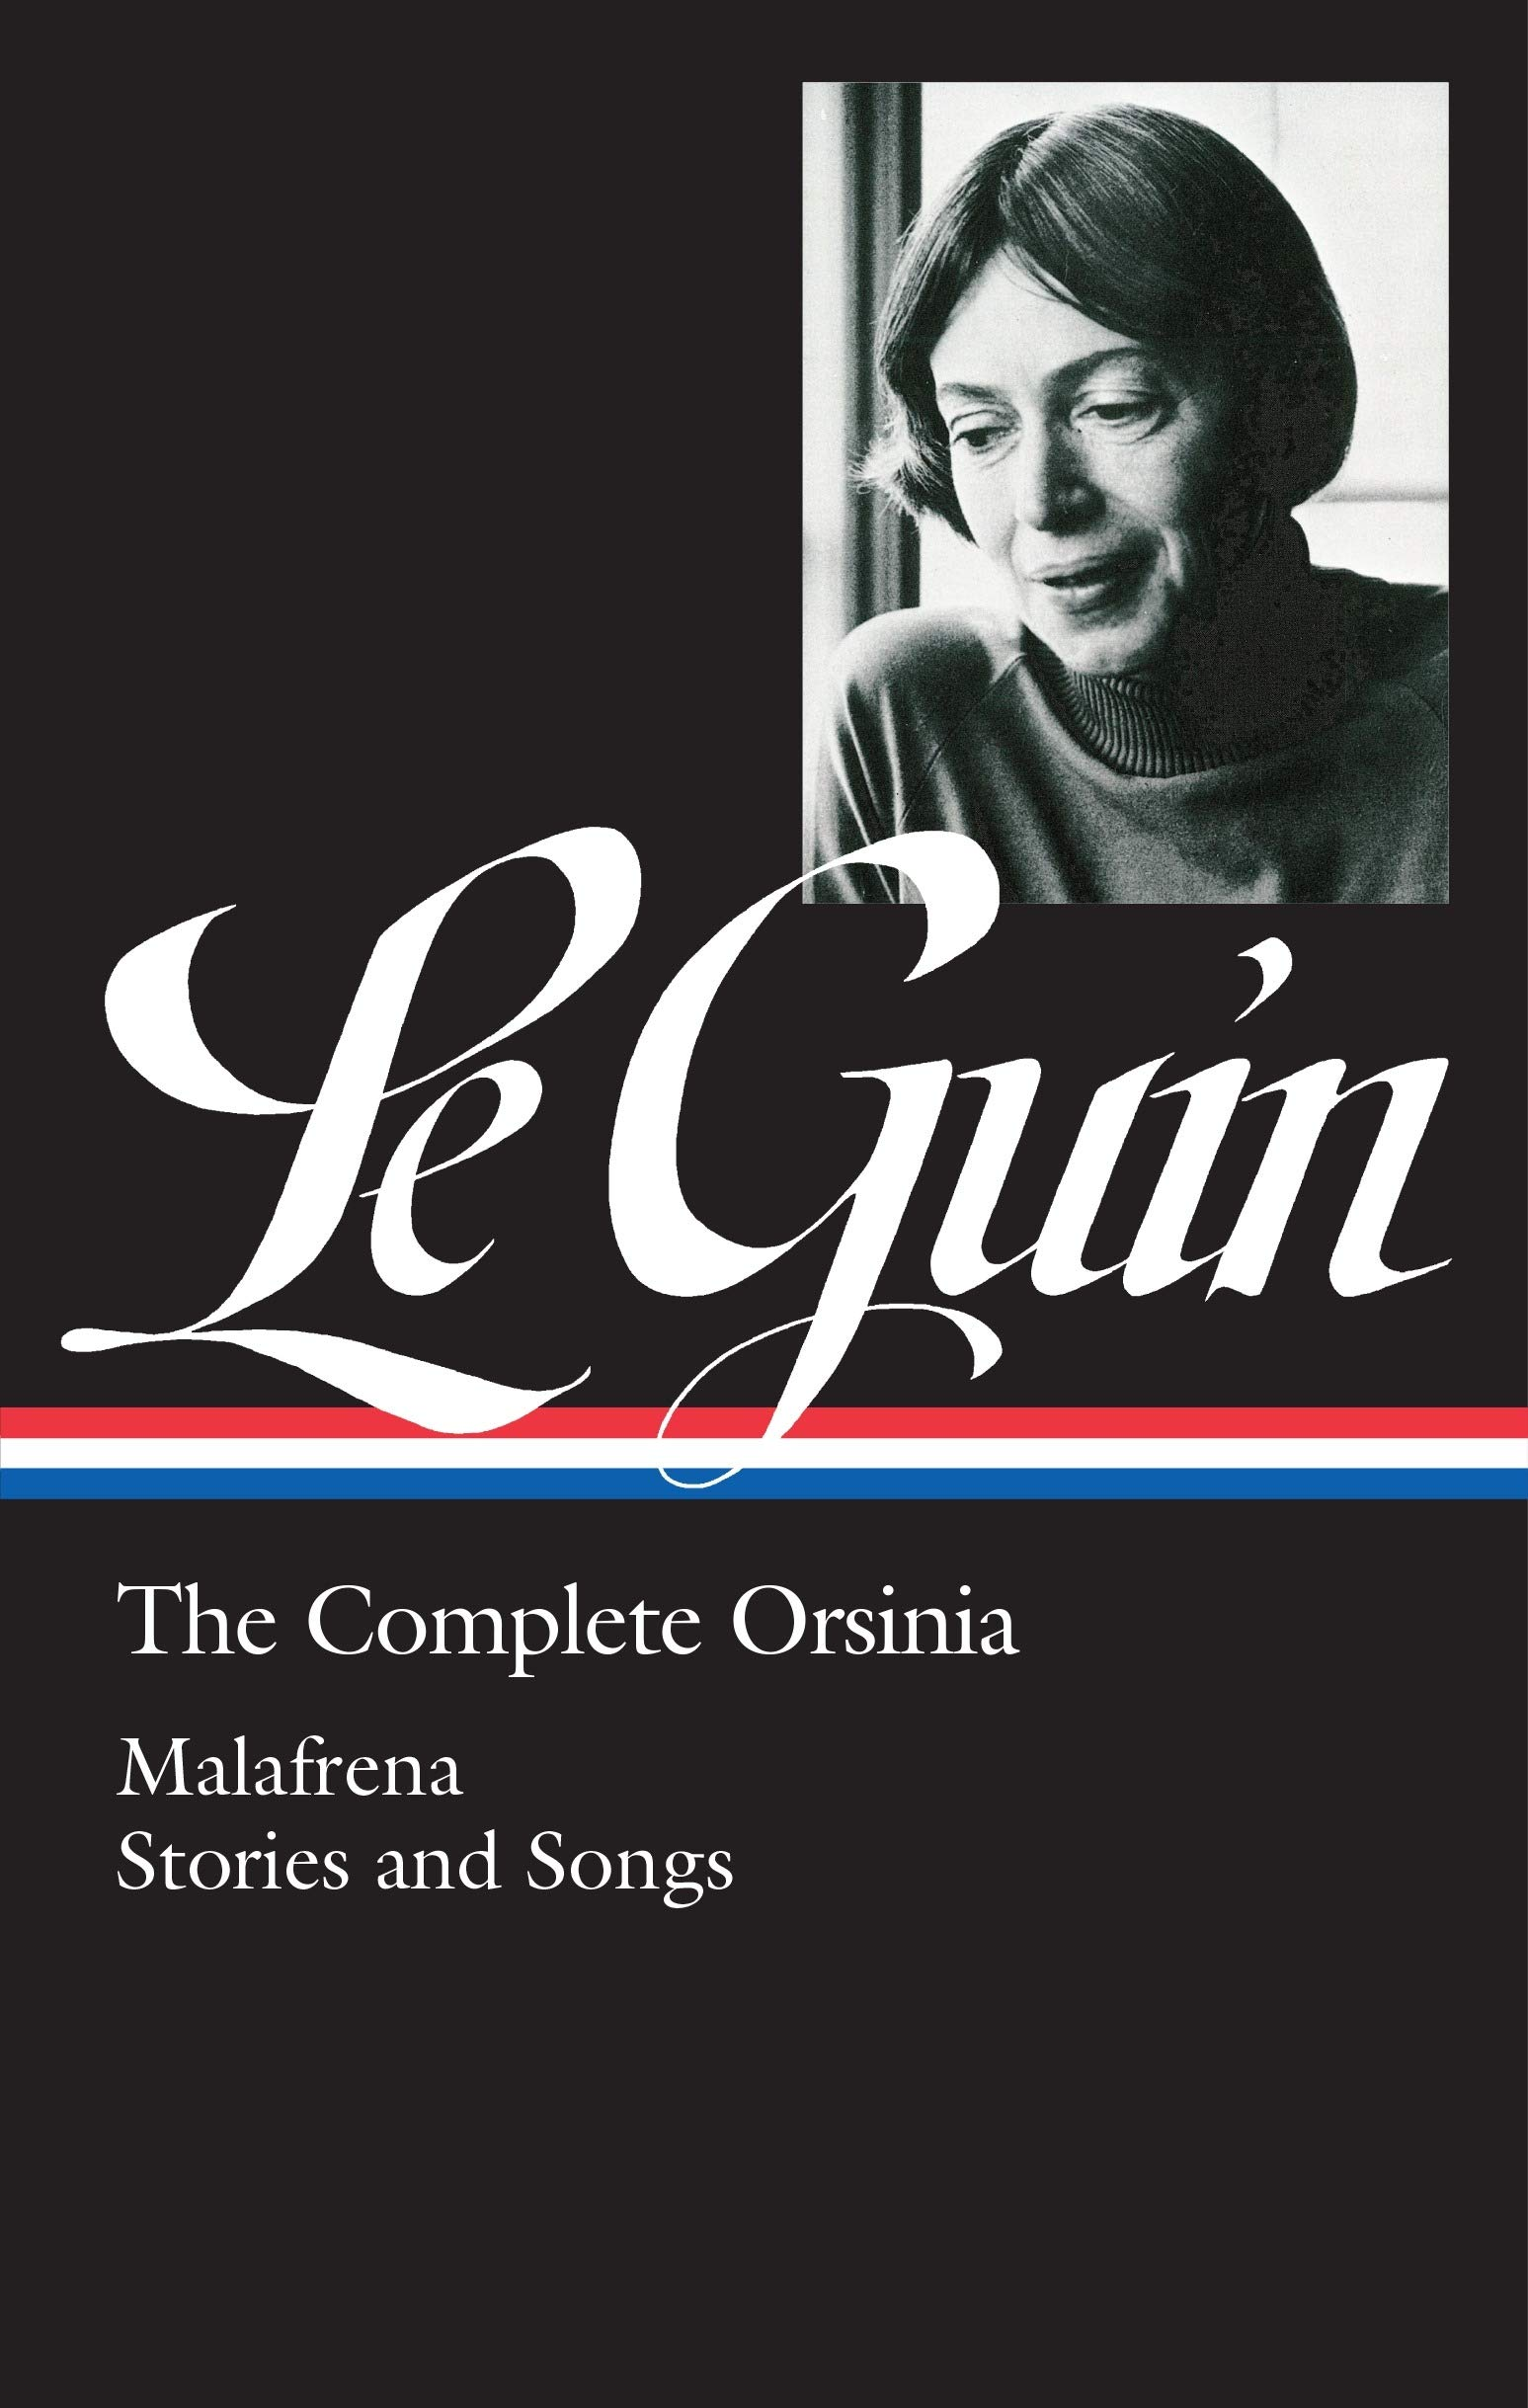 complete orsinia